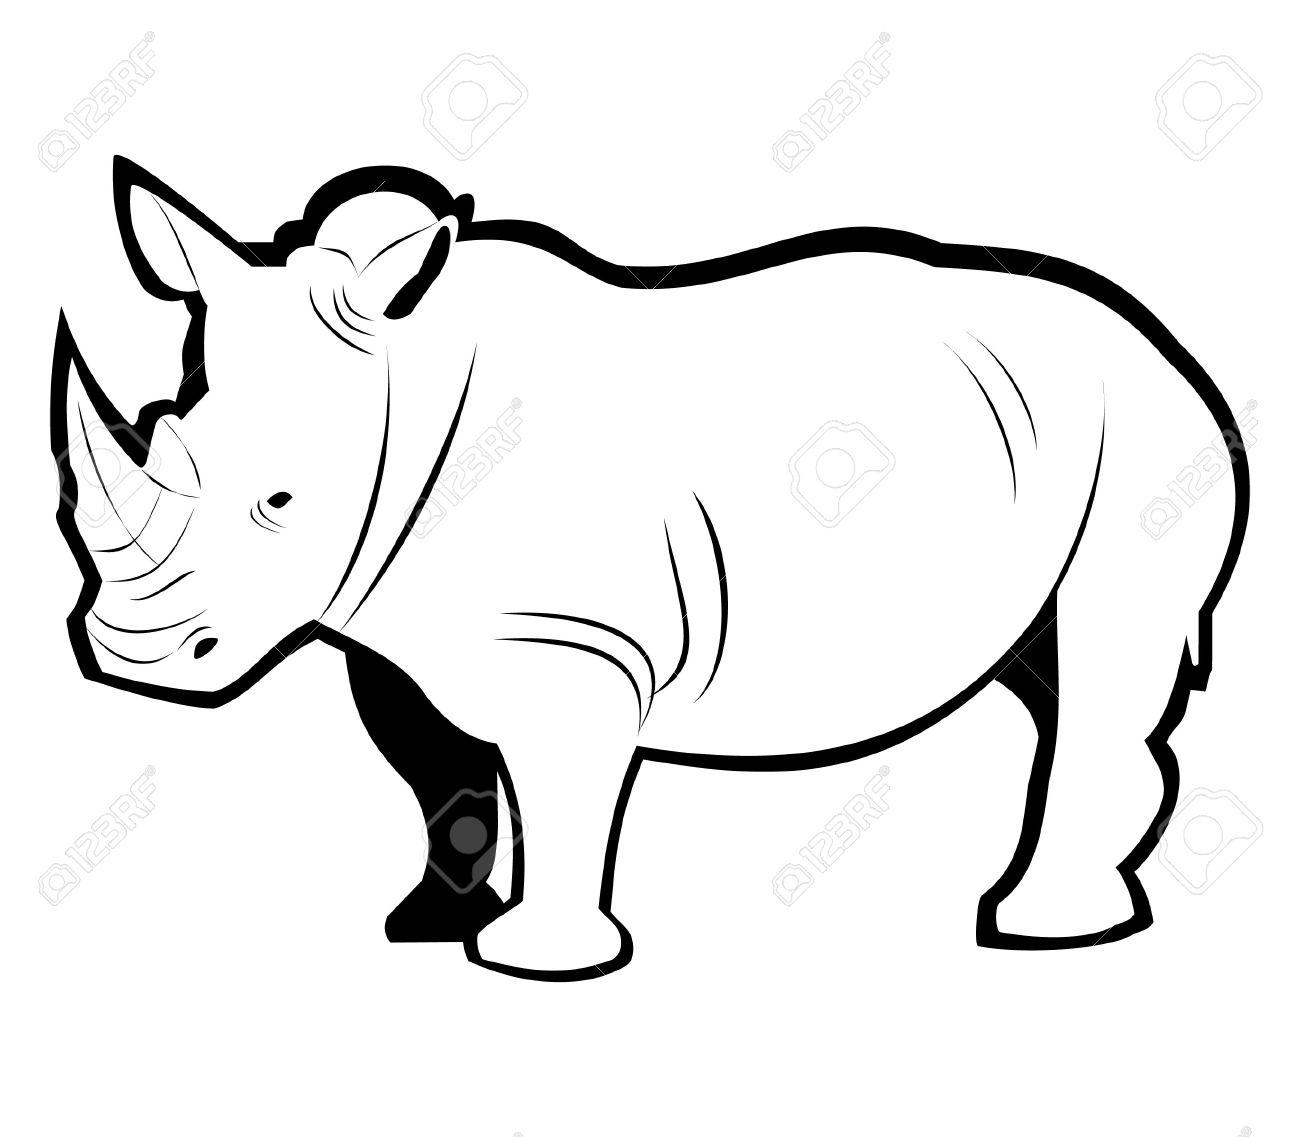 Rhino Drawing | Free download best Rhino Drawing on